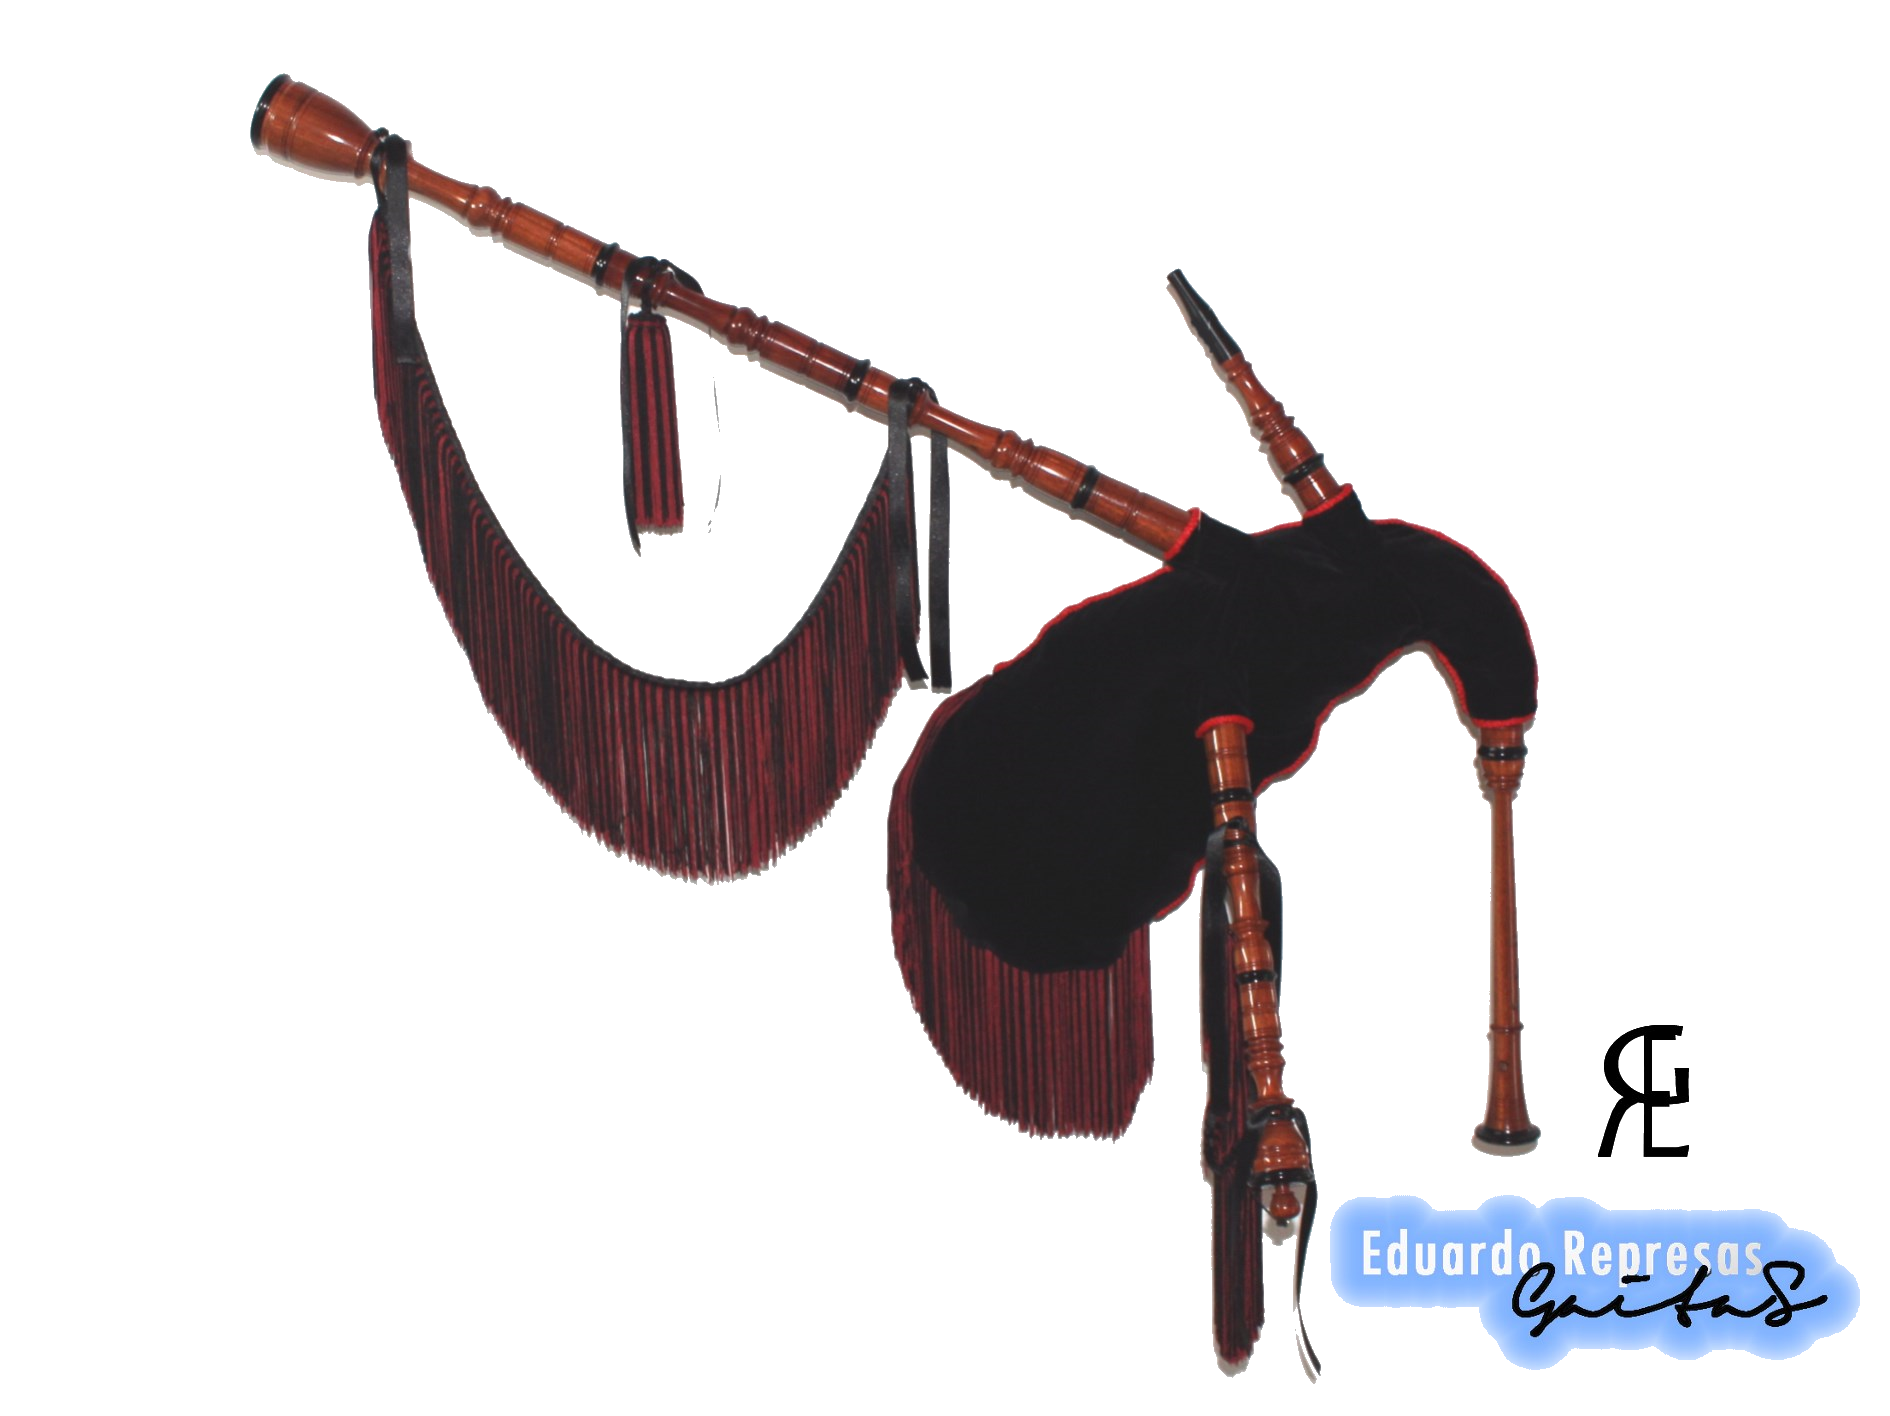 mukulungo-306-obradoiro-gaitas-Eduardo-Represas